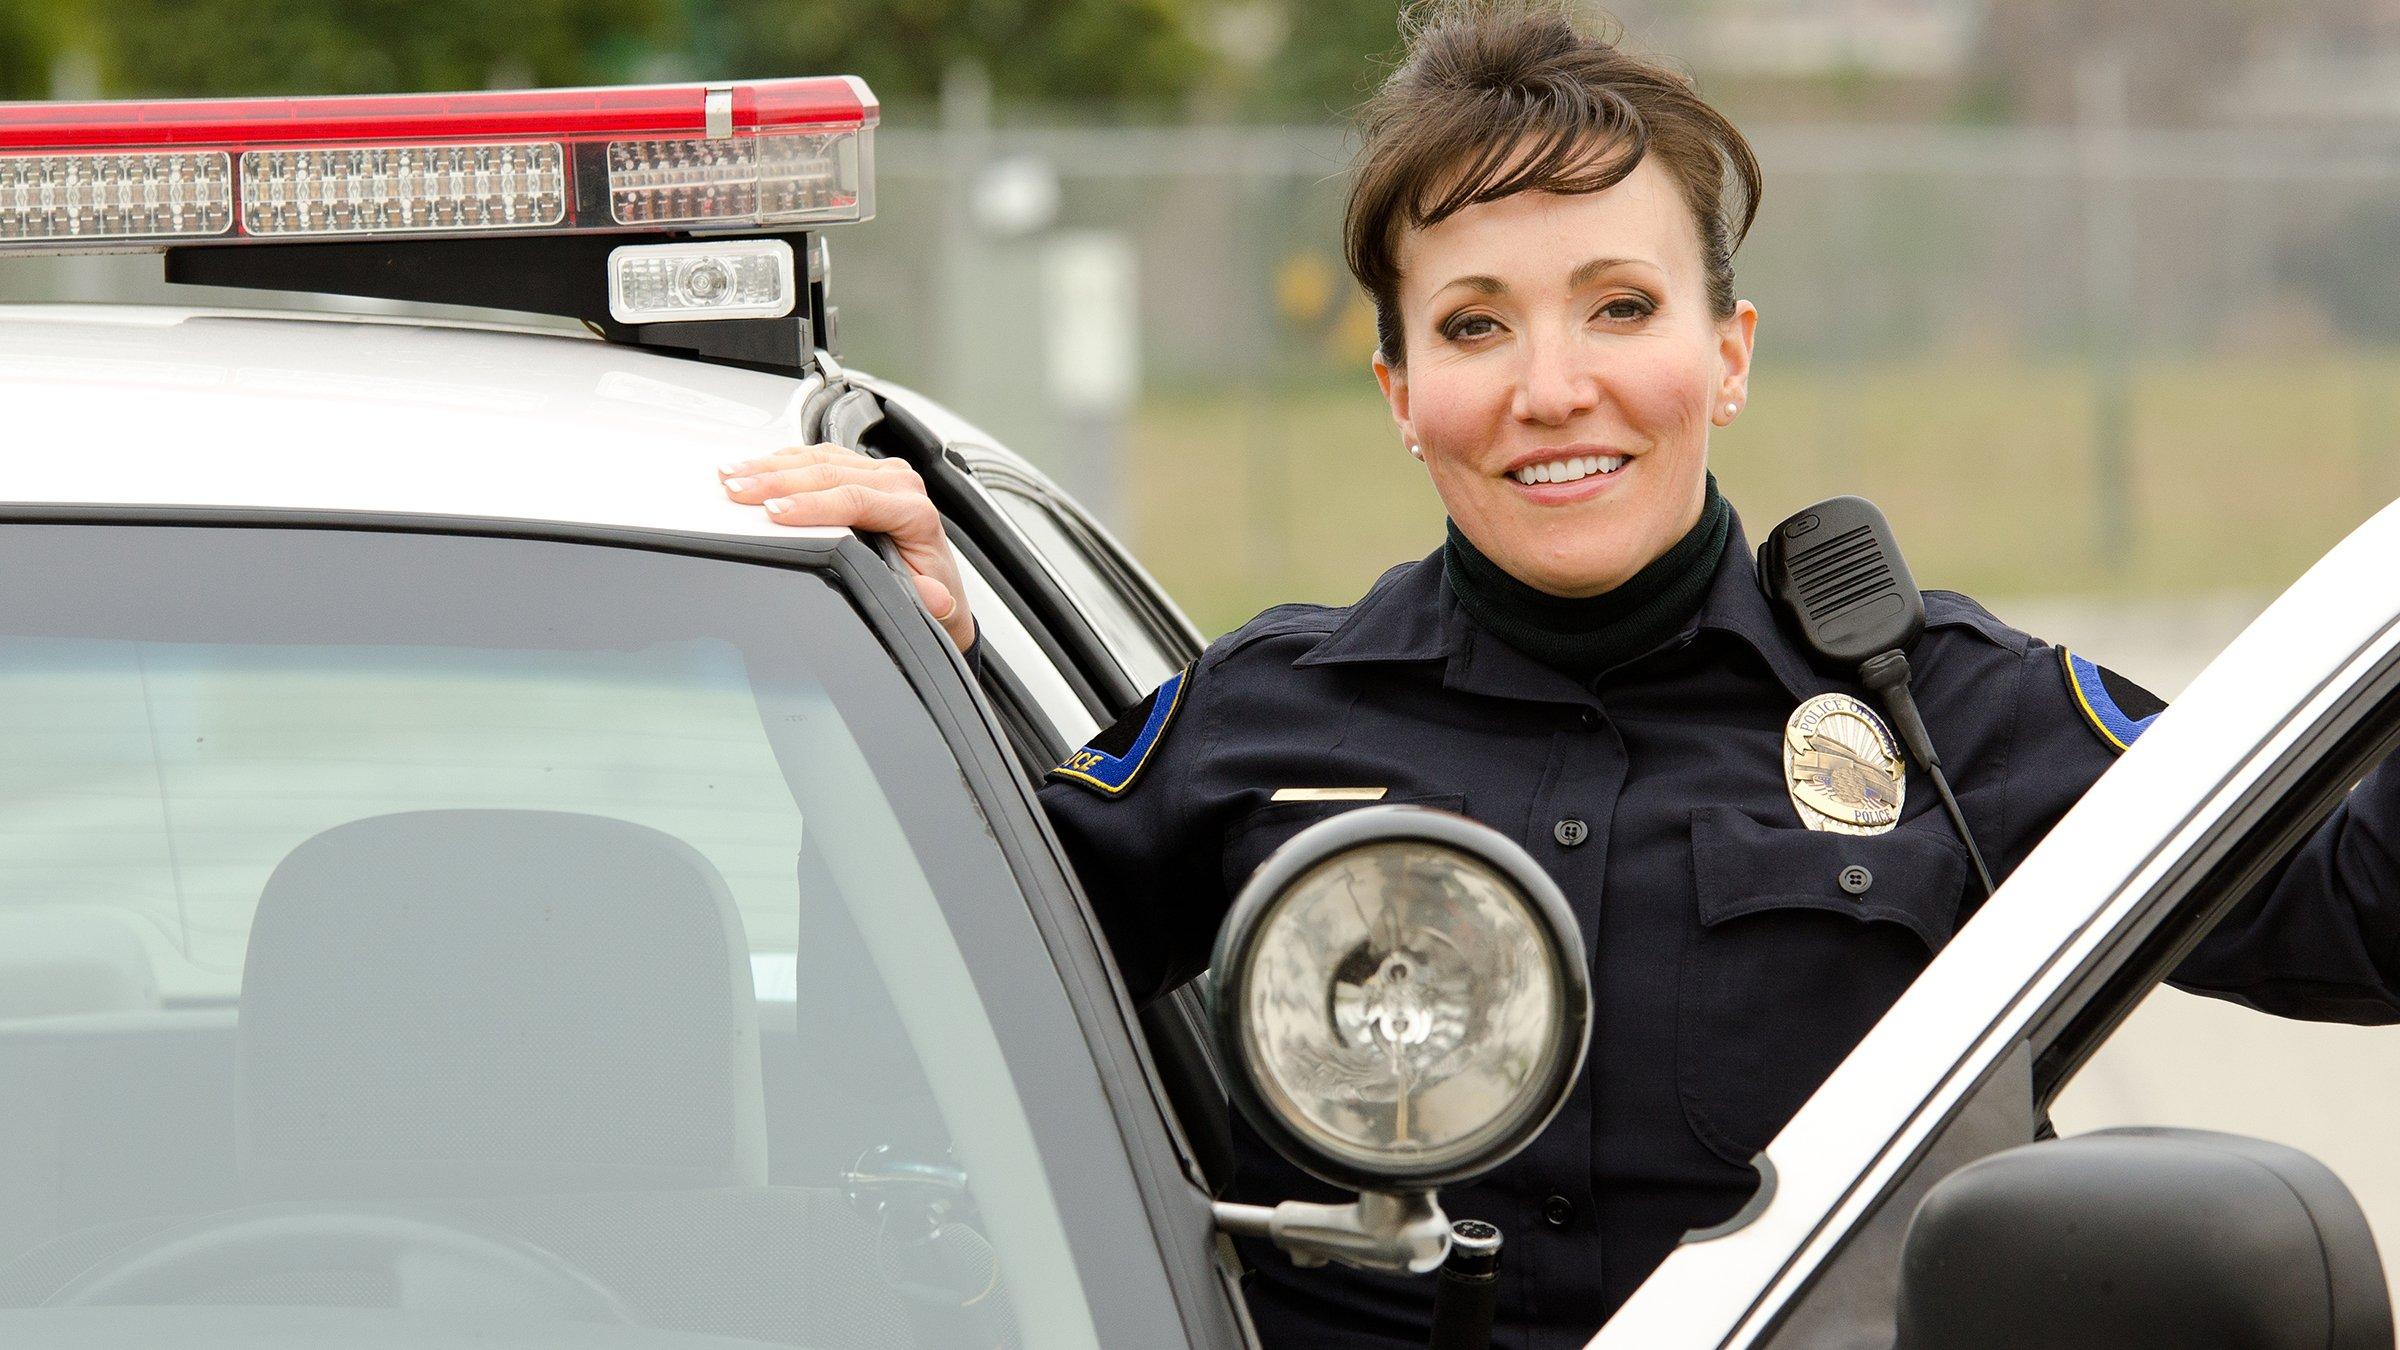 The Police Academy Survey 1